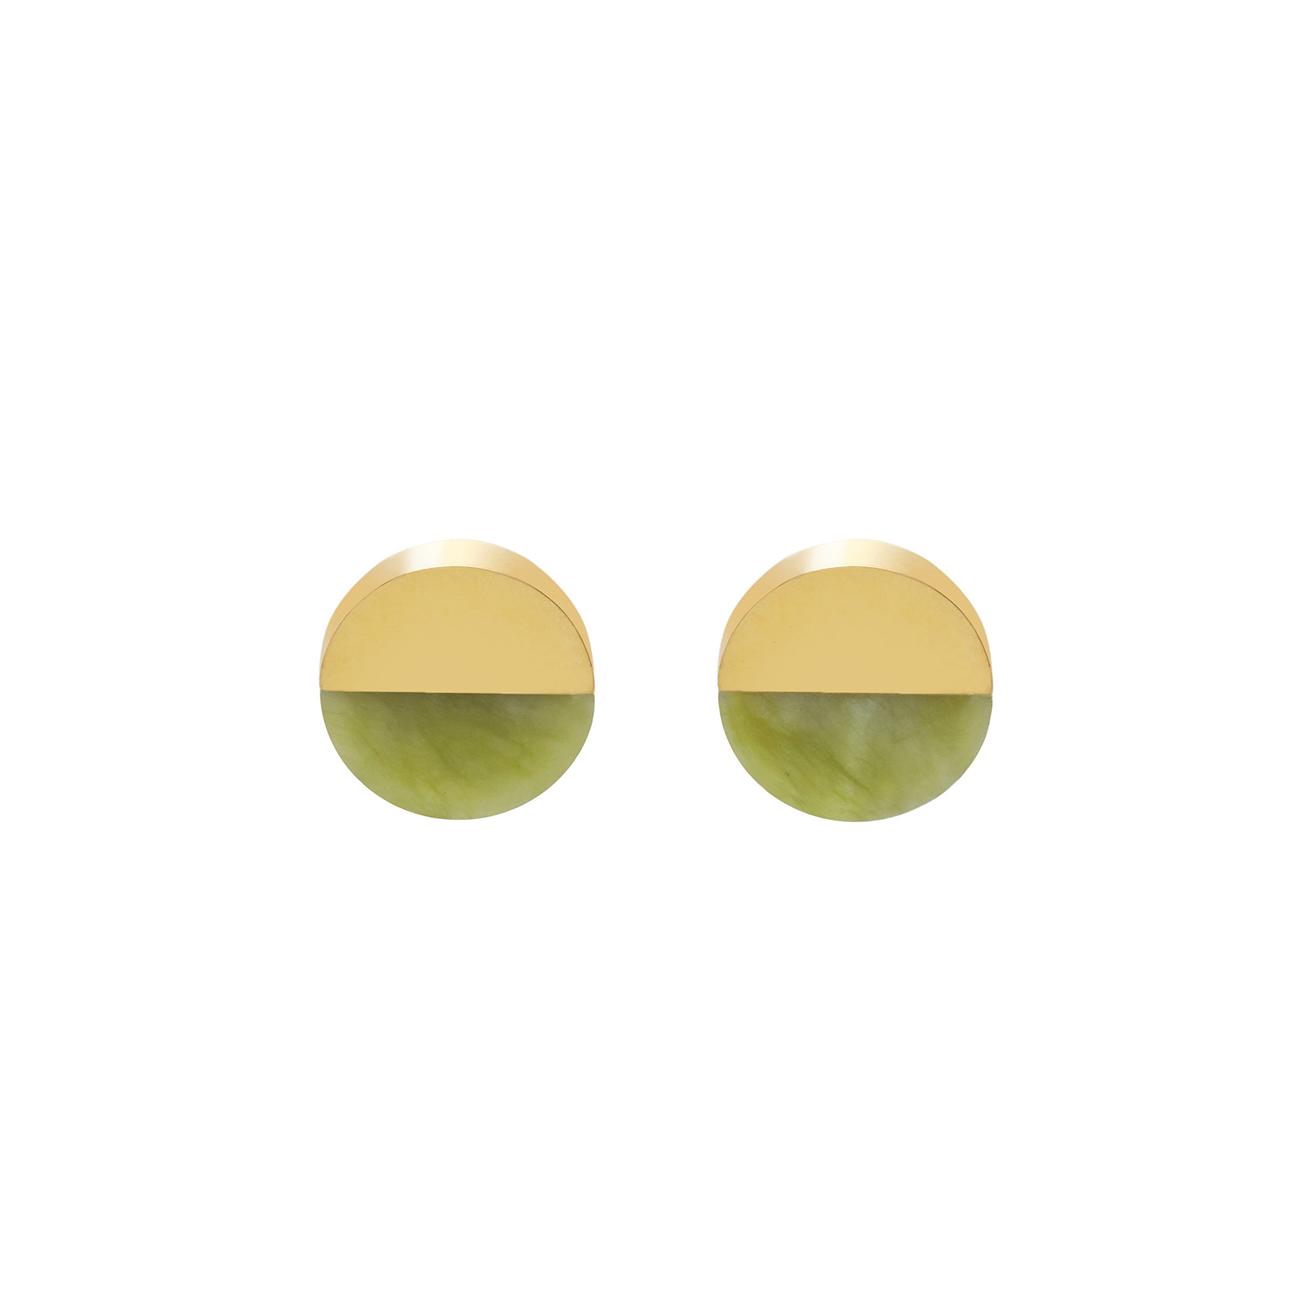 metaformi_design_jewelry_split_round_earrings_jade